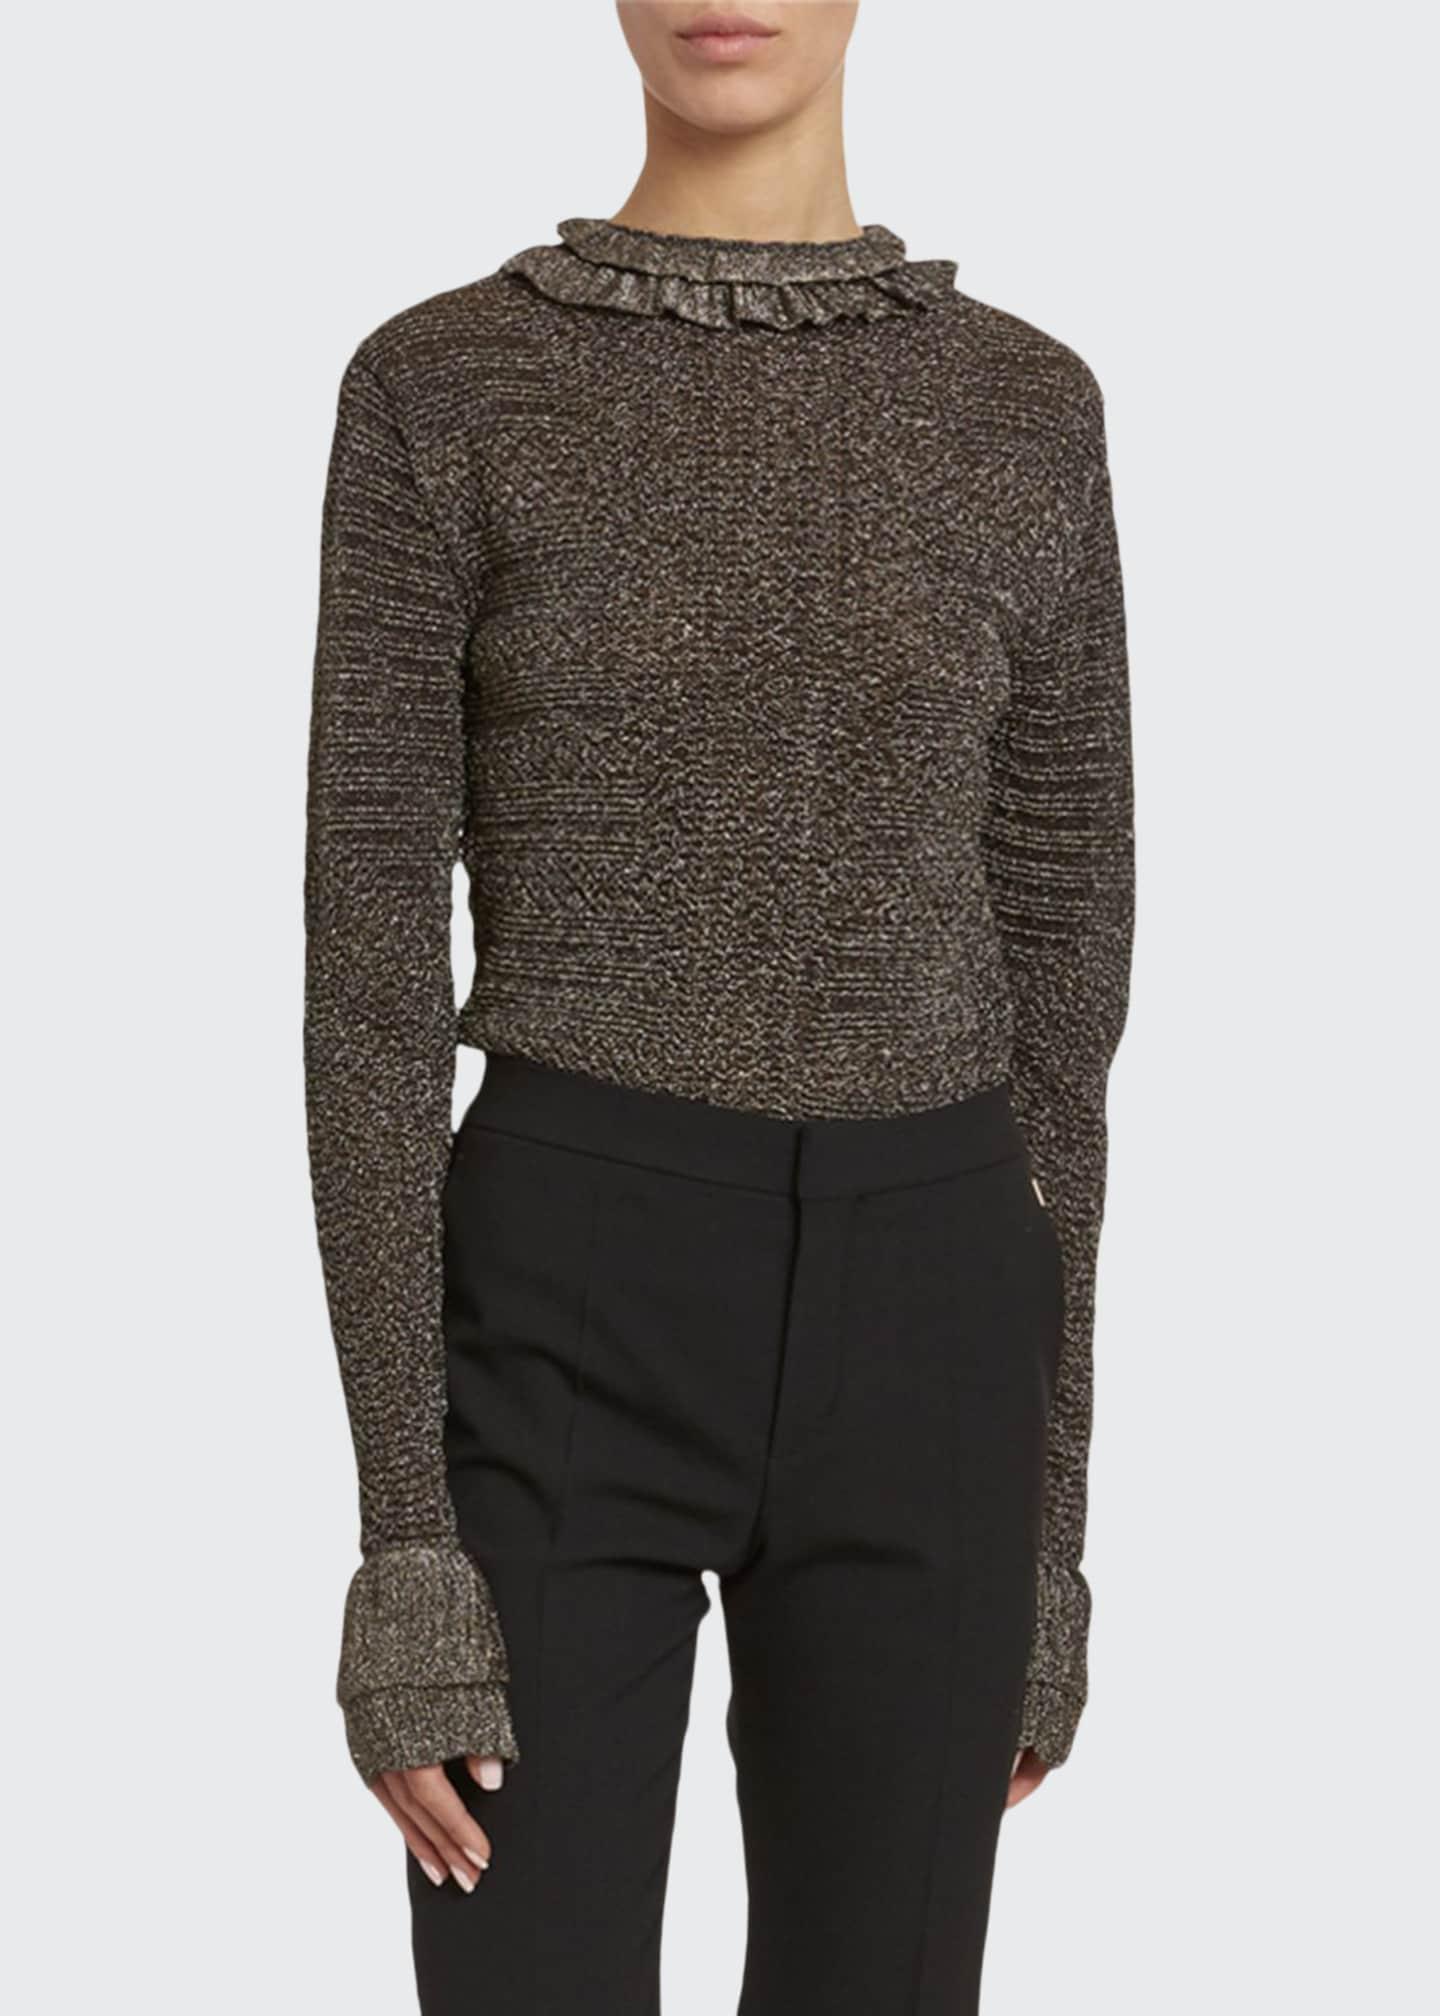 Chloe Metallic-Knit Ruffled High-Neck Sweater